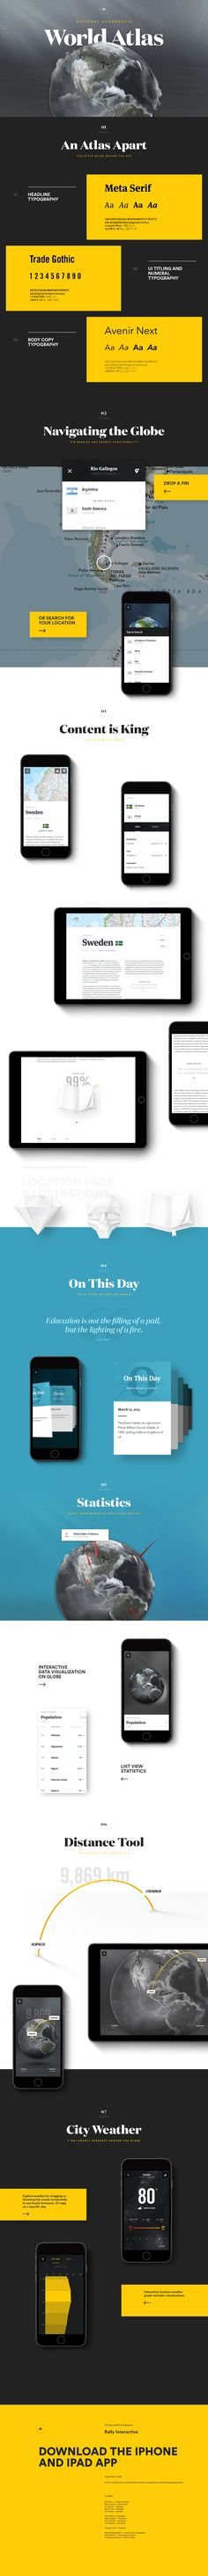 App typography - National Geographic - World Atlas case study - Stunning work